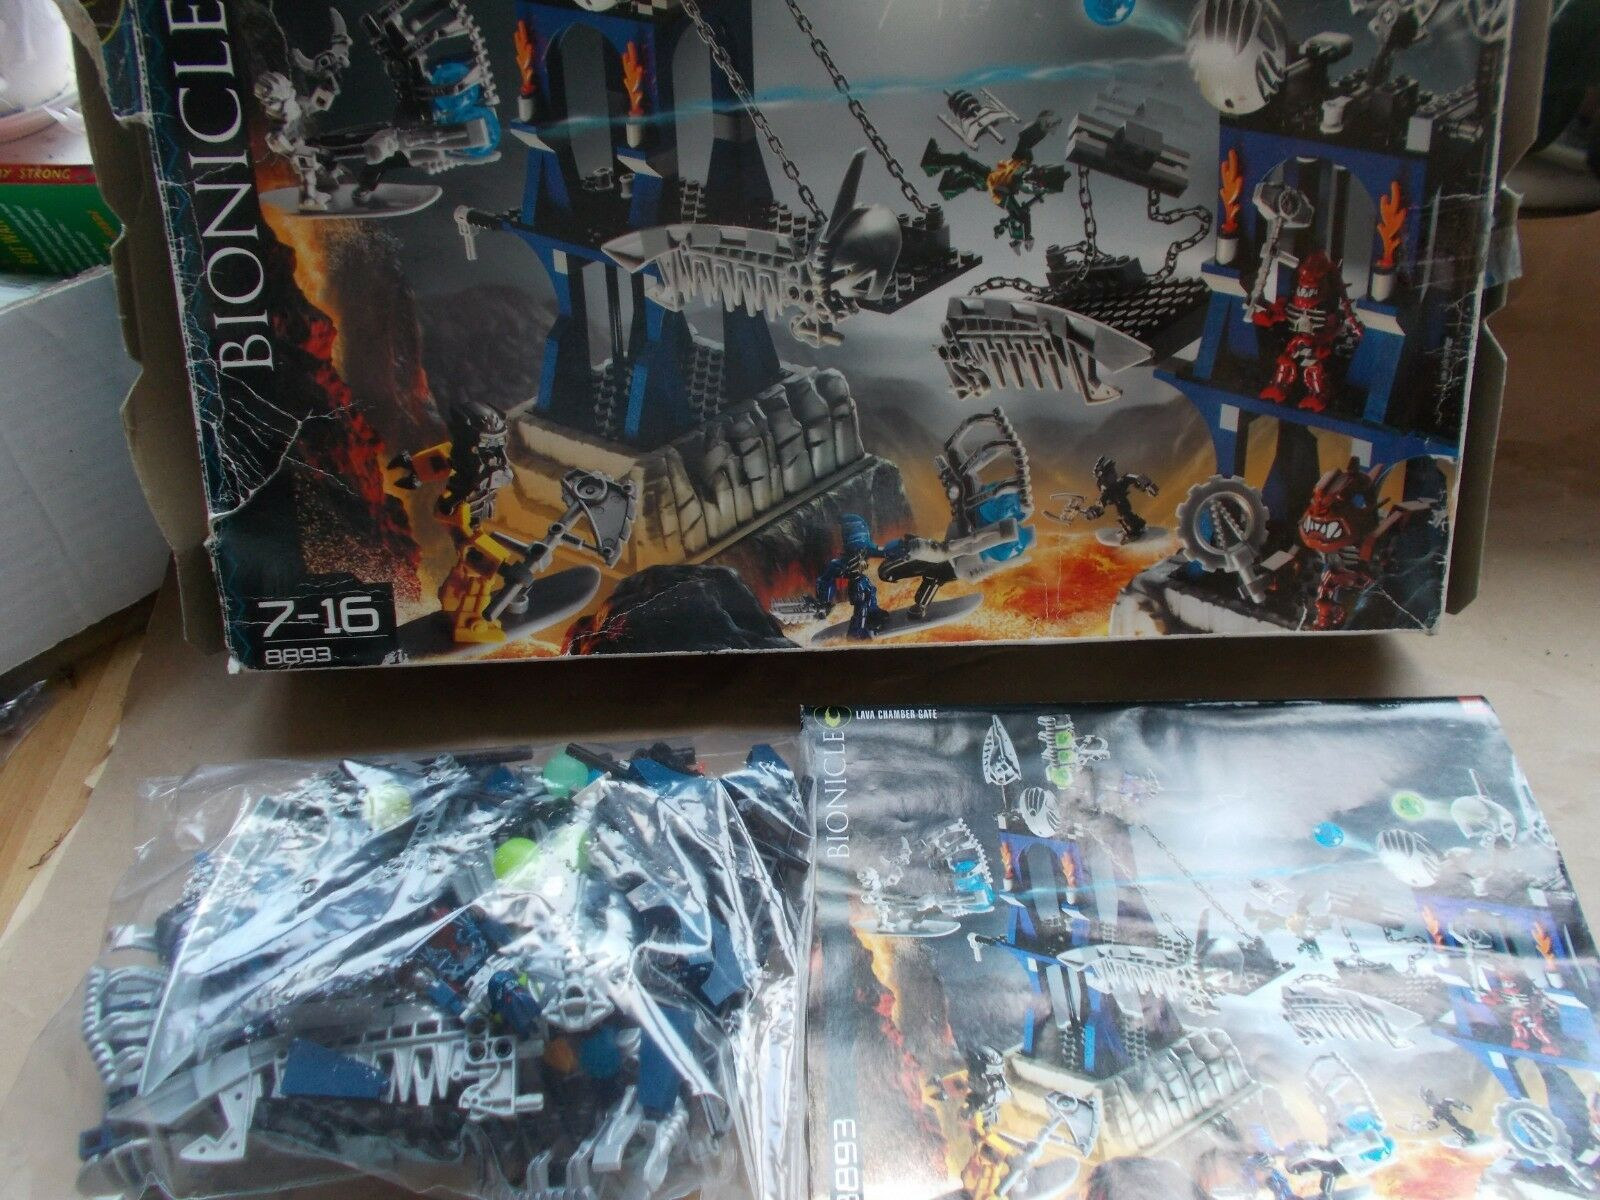 In Scatola LEGO BIONICLE SET 8893-telecamera Lava CANCELLO Playset  TOA INIKA PIRAKA Zamors  marchio famoso